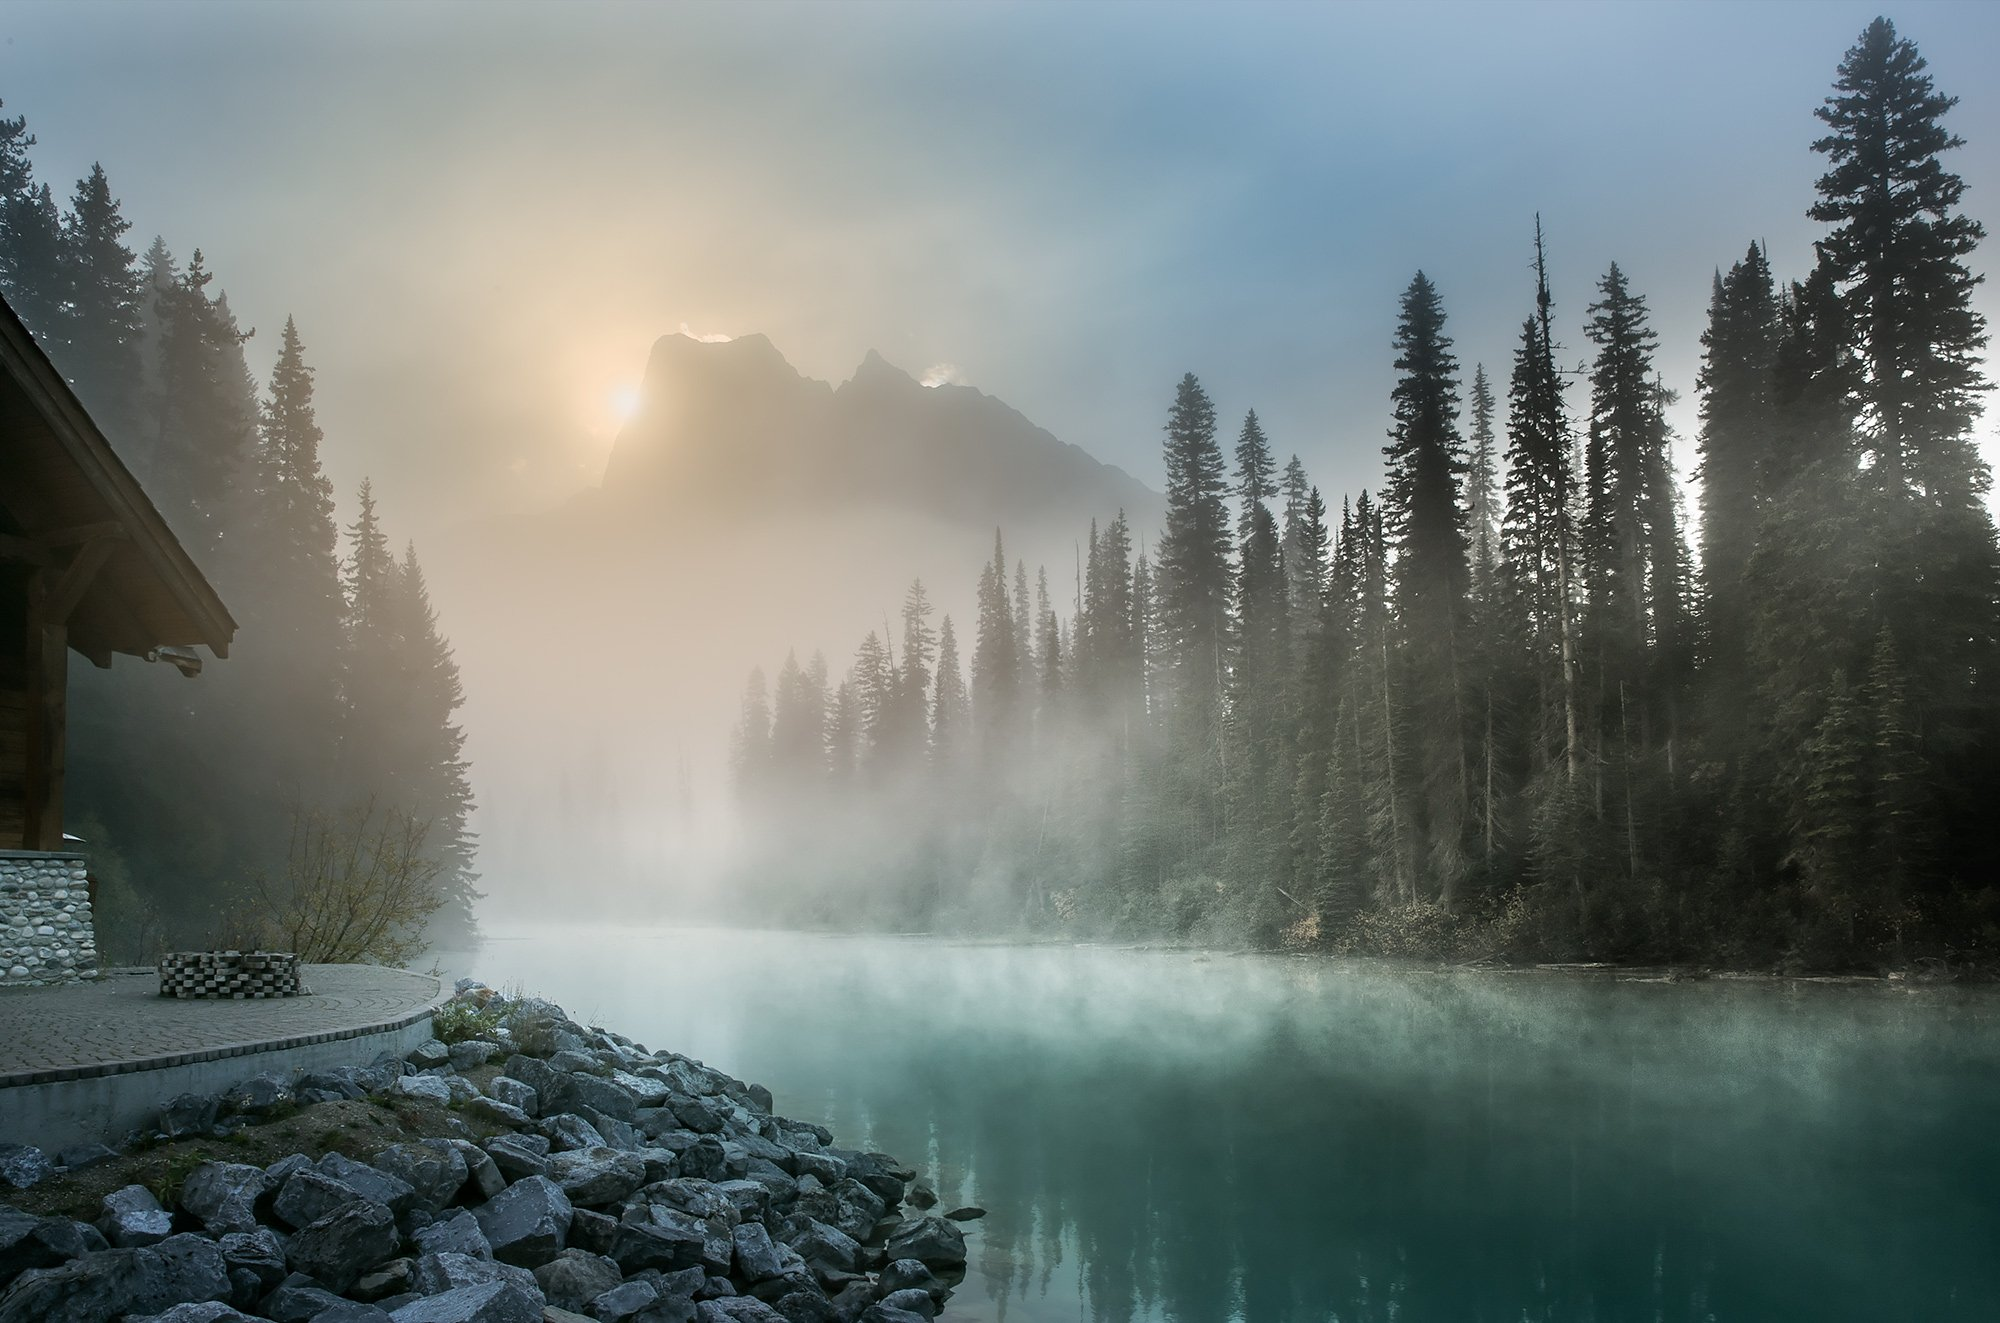 emerald rockies fog trees sun lake, Evgeny